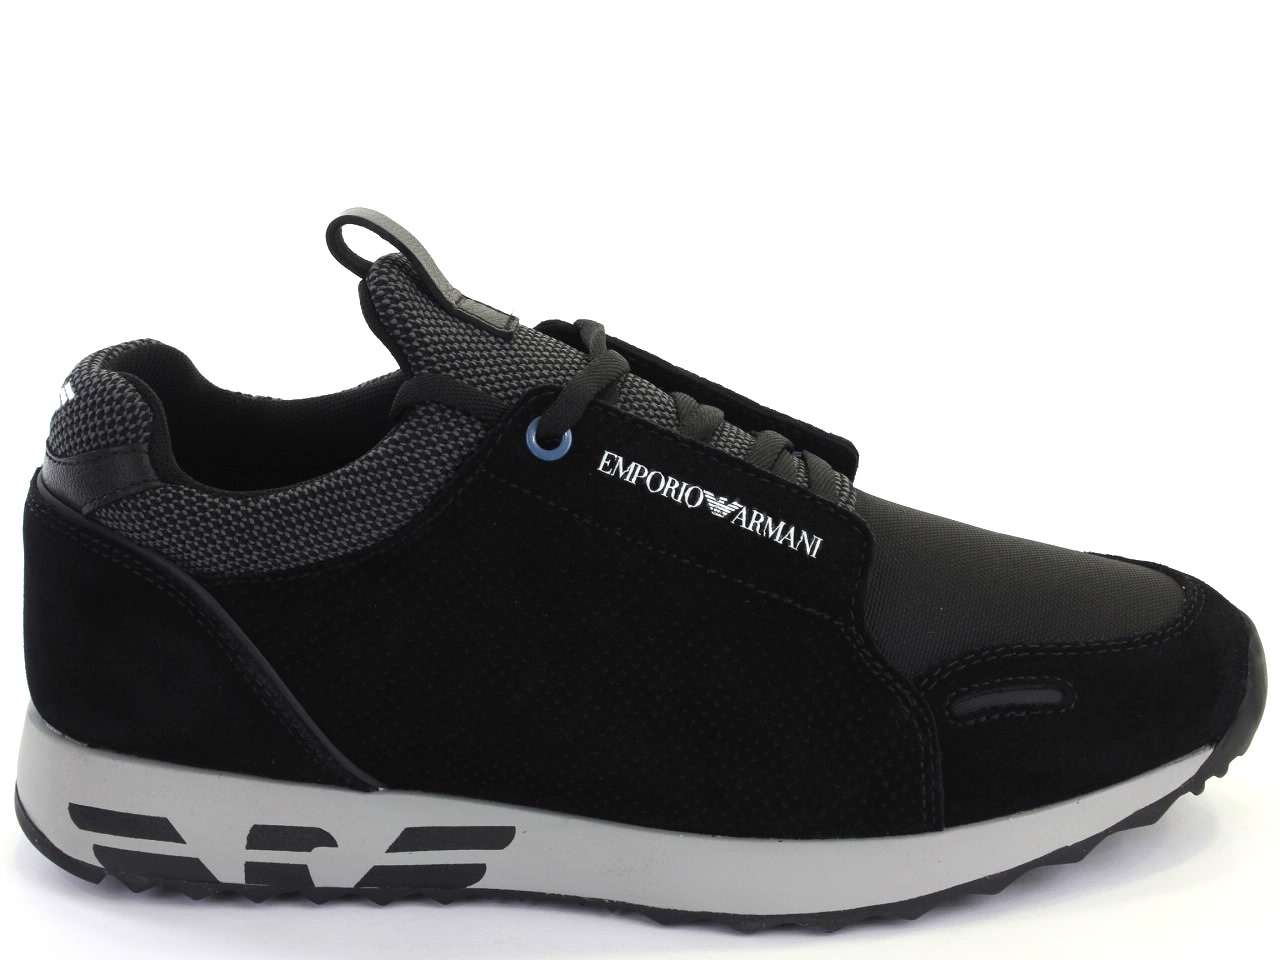 Sneakers and Espadrilles Armani, Emporio - 529 X4X241 XL690 M997